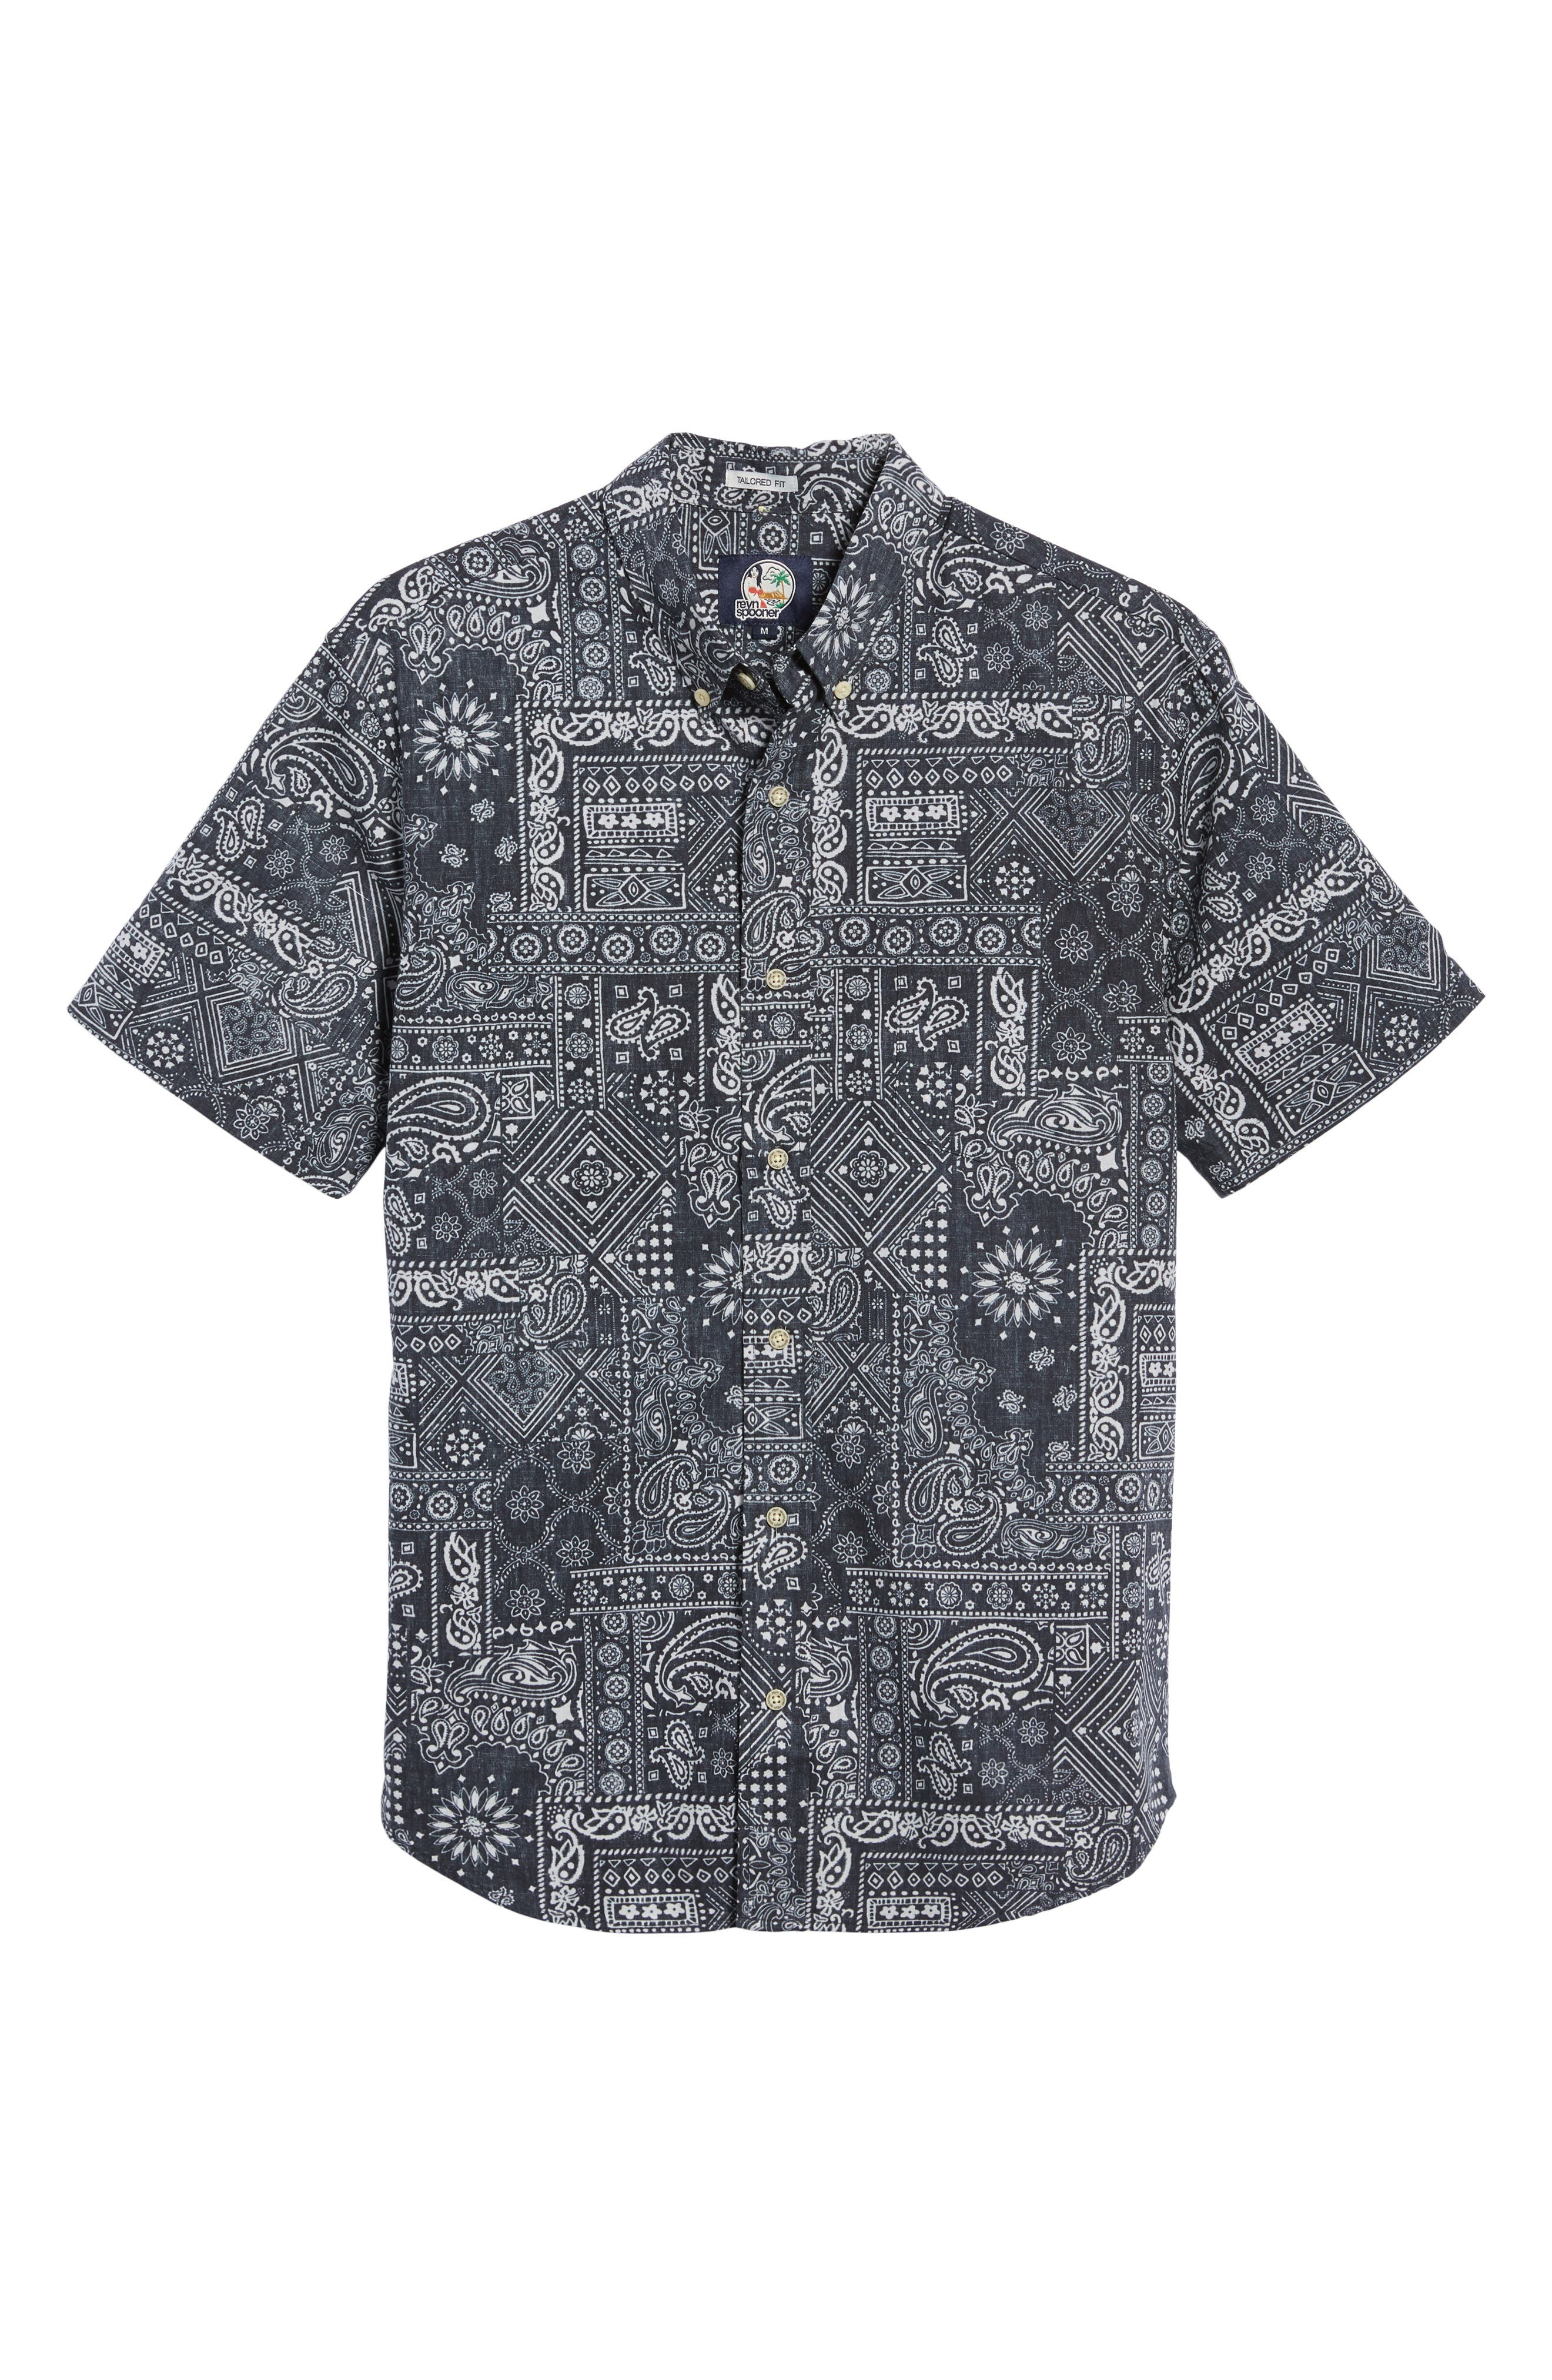 REYN SPOONER, Aloha Bandana Regular Fit Sport Shirt, Alternate thumbnail 5, color, 001